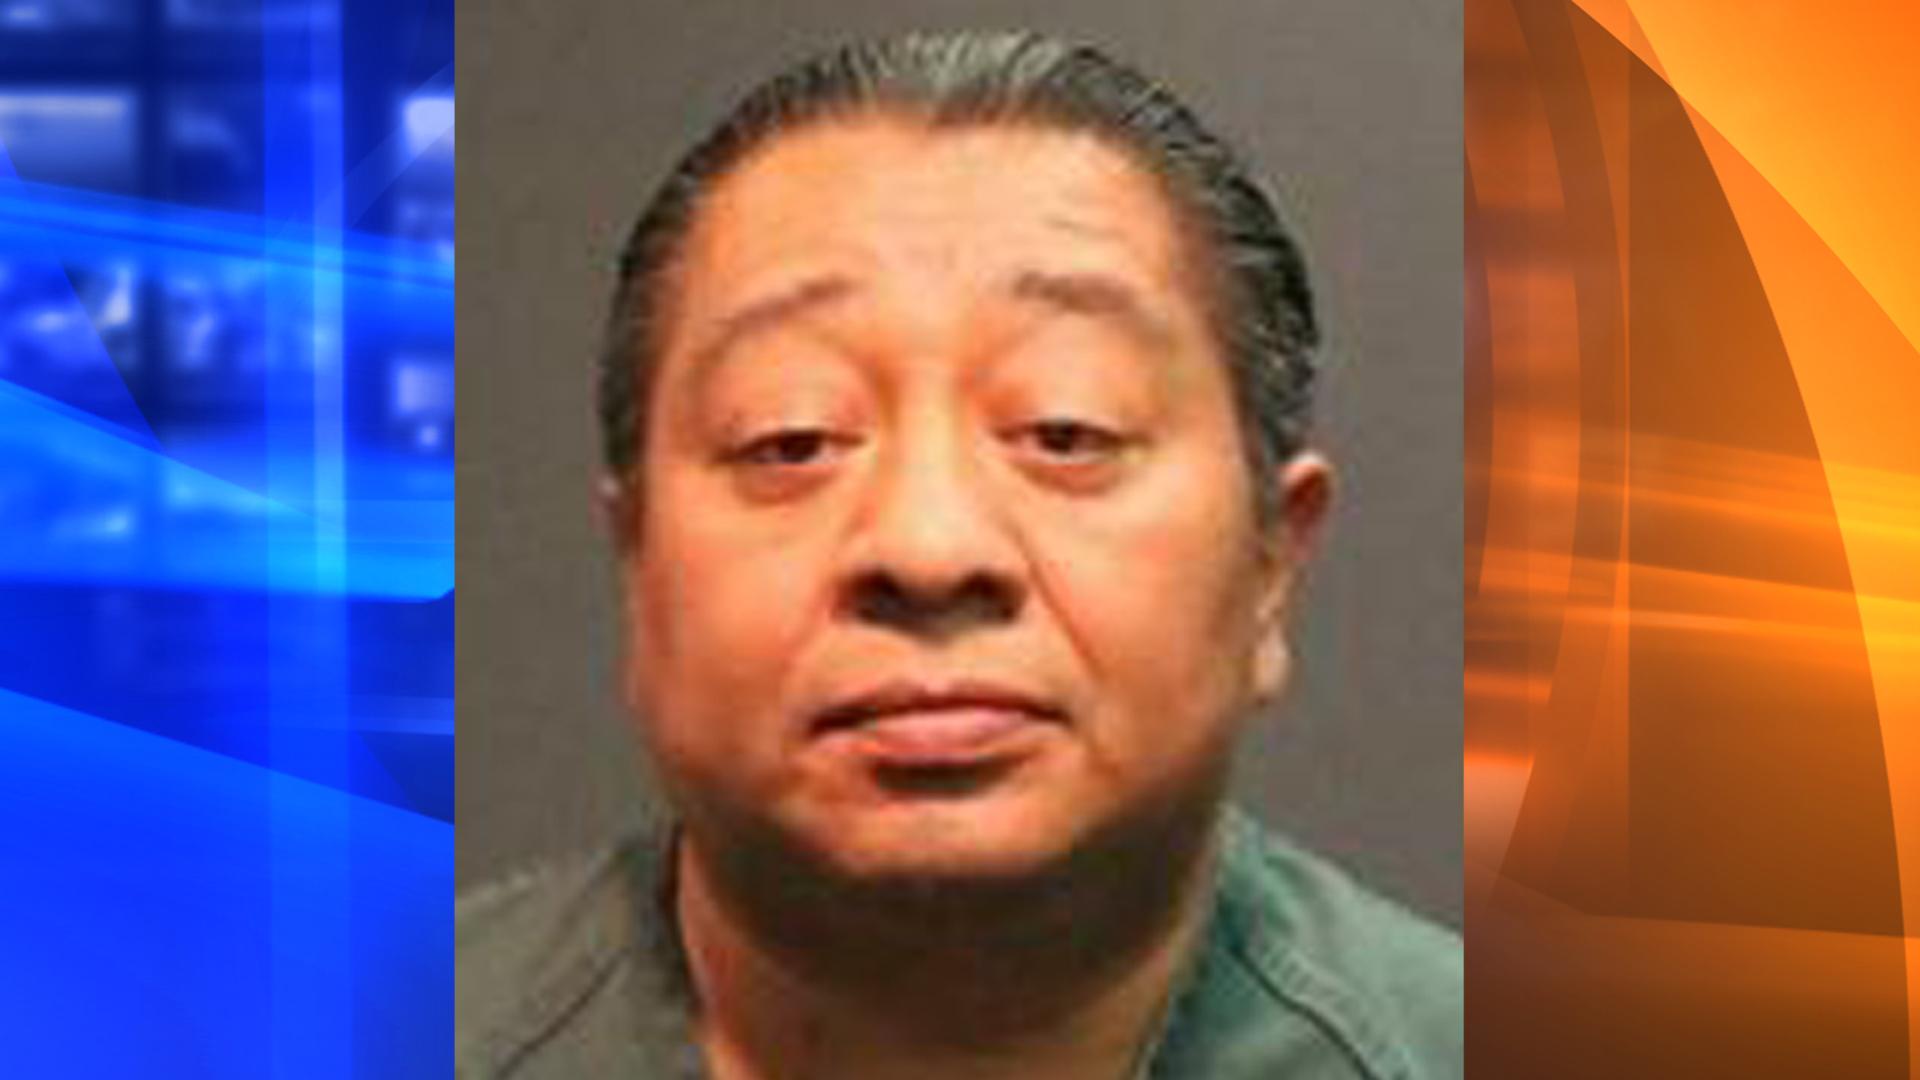 Juan Carlos Alcantara, 47, is seen in a photo released by Santa Ana police on Oct. 19, 2018.